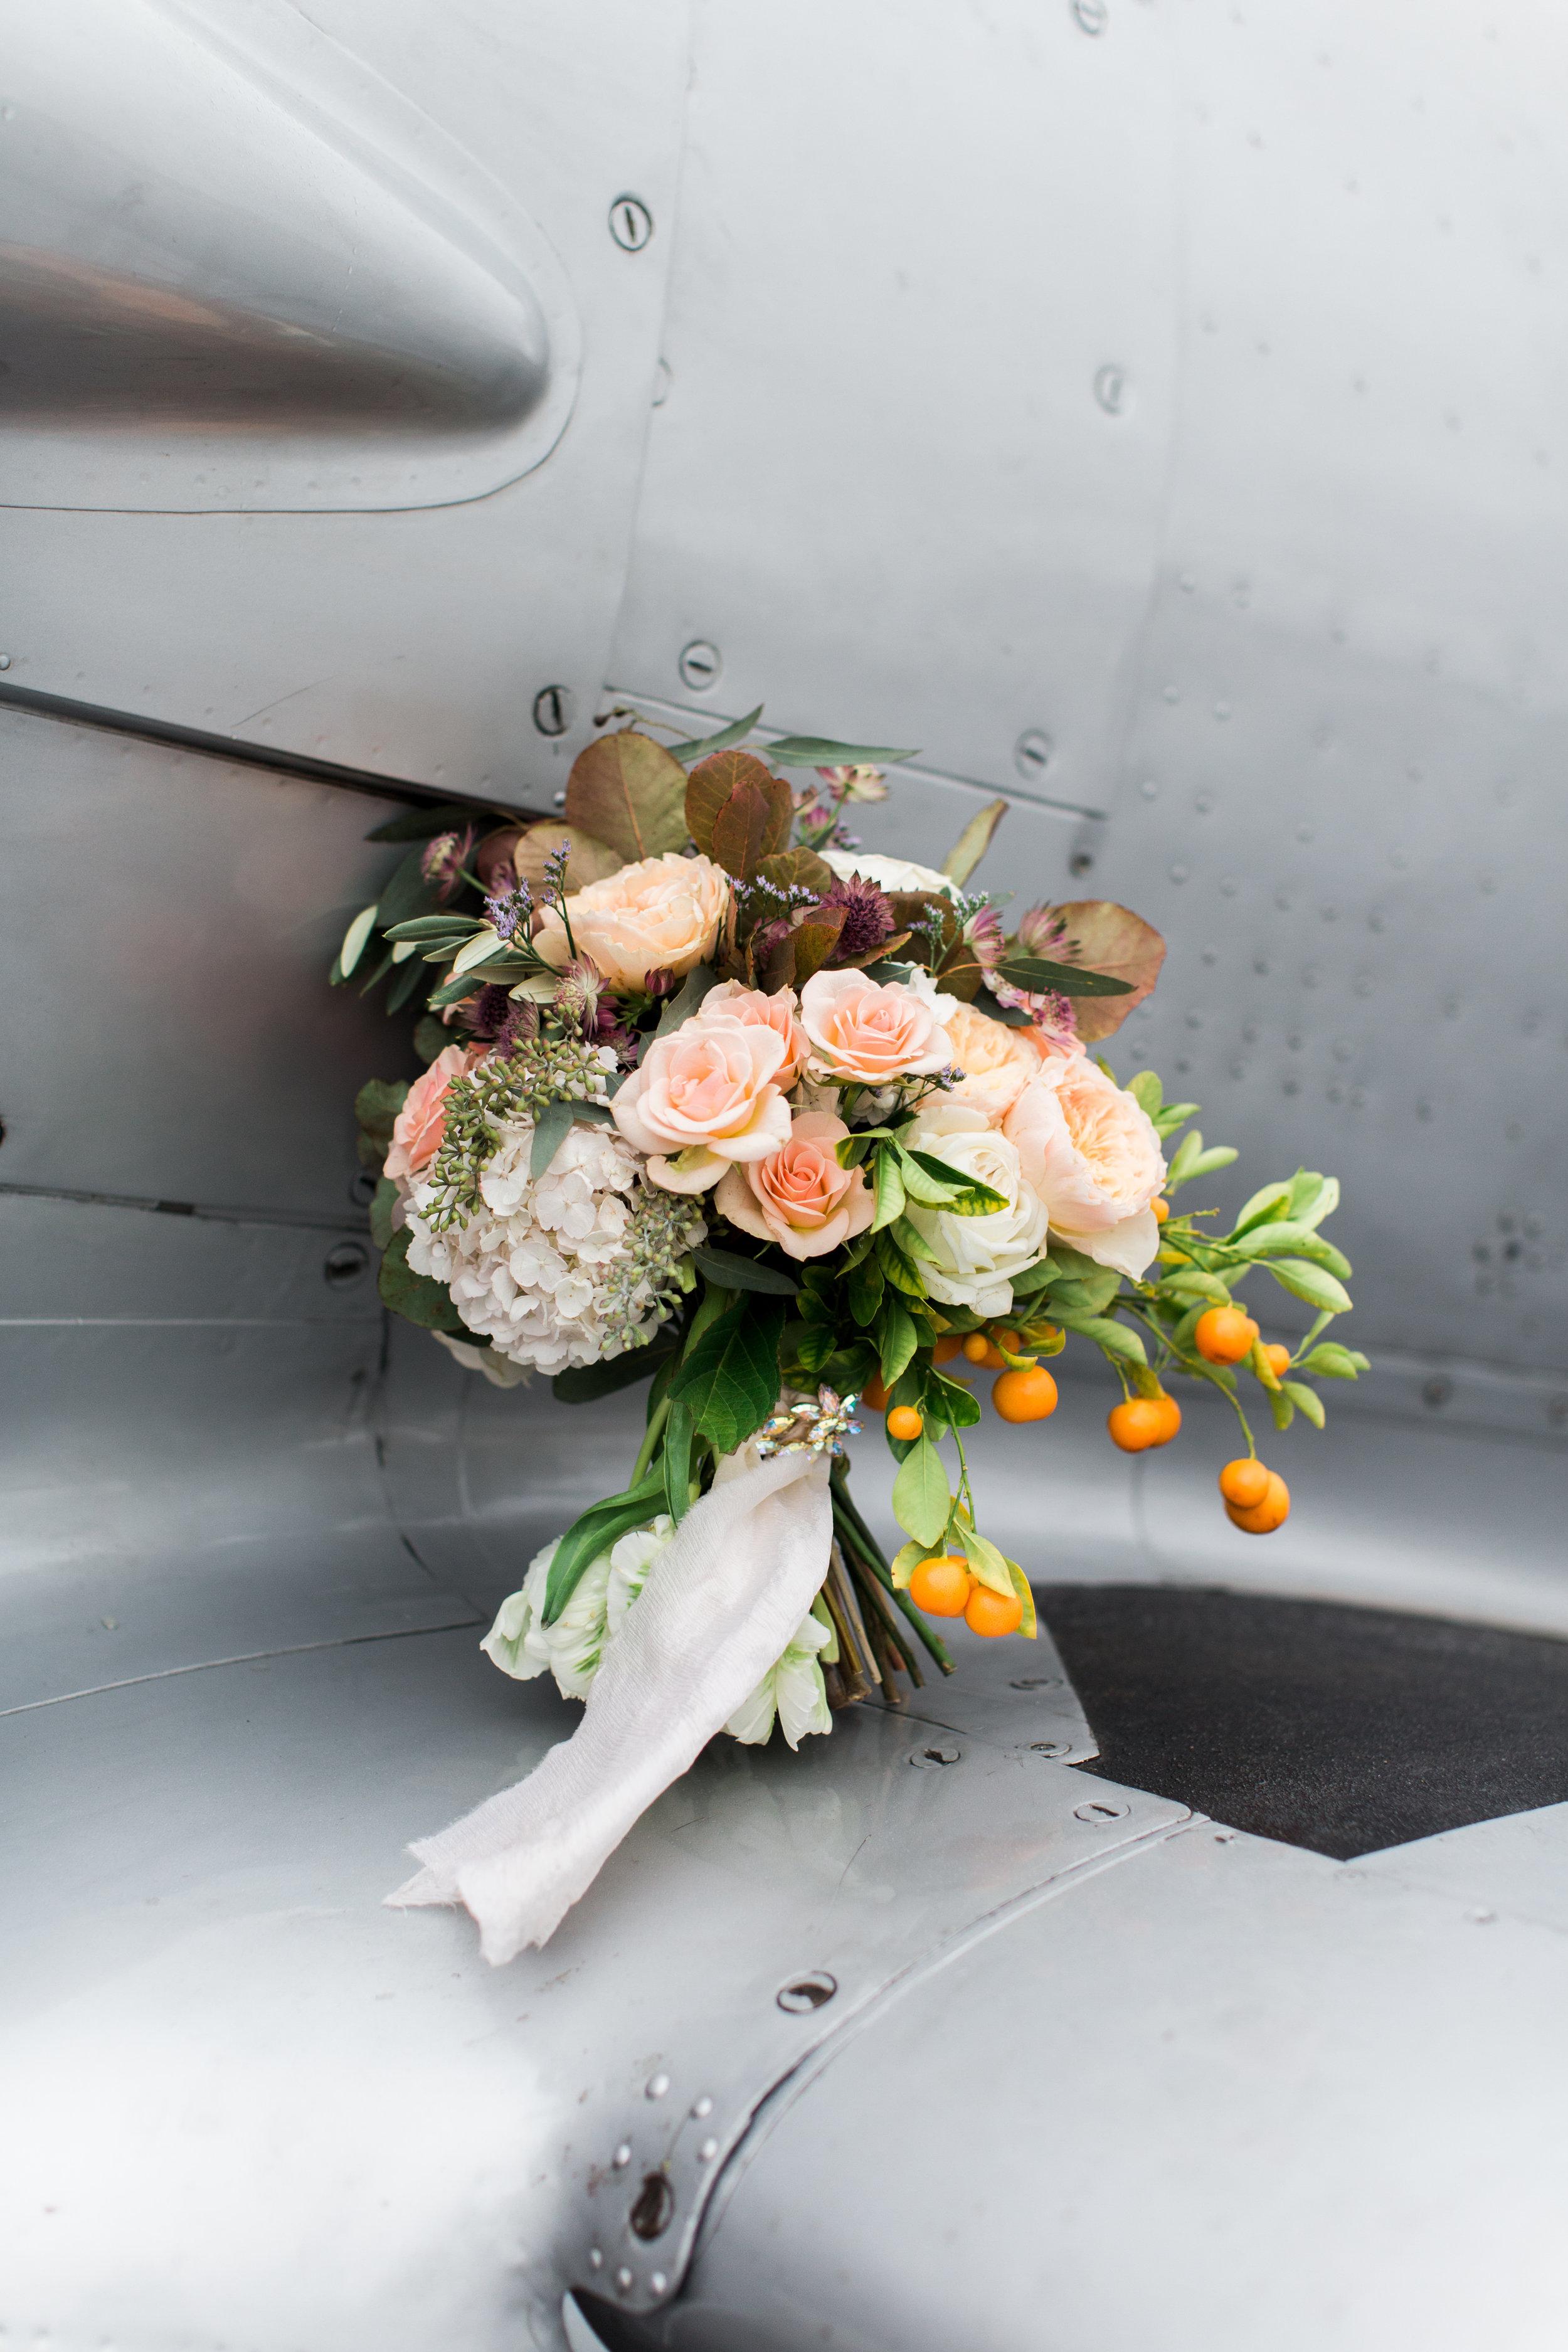 airport-hanger-wedding-at-attitude-aviation-in-livermore-90.jpg